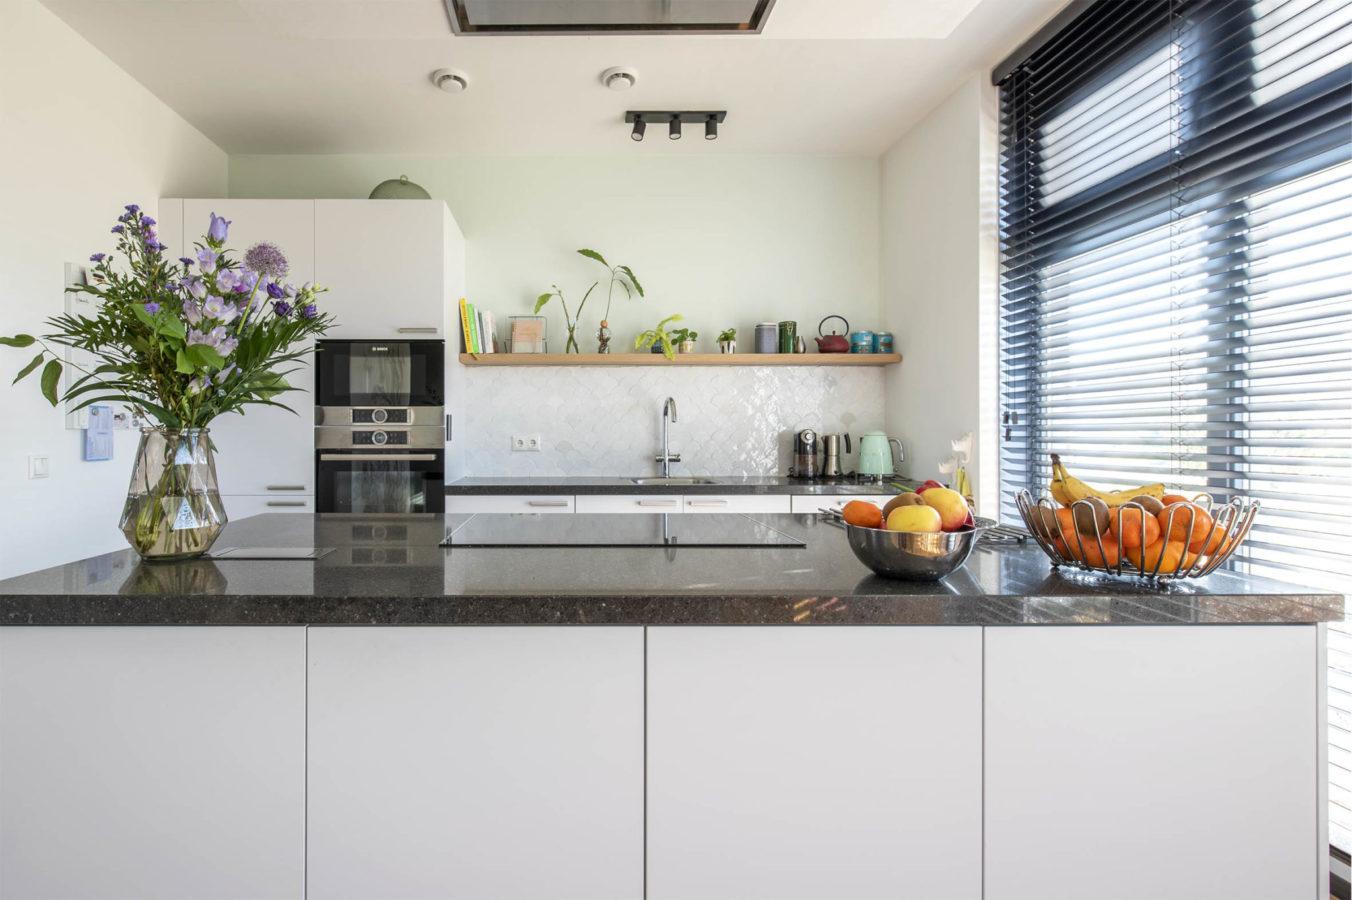 Keuken Breda interieurontwerp interieuradvies keukeneiland styling nieuwbouw